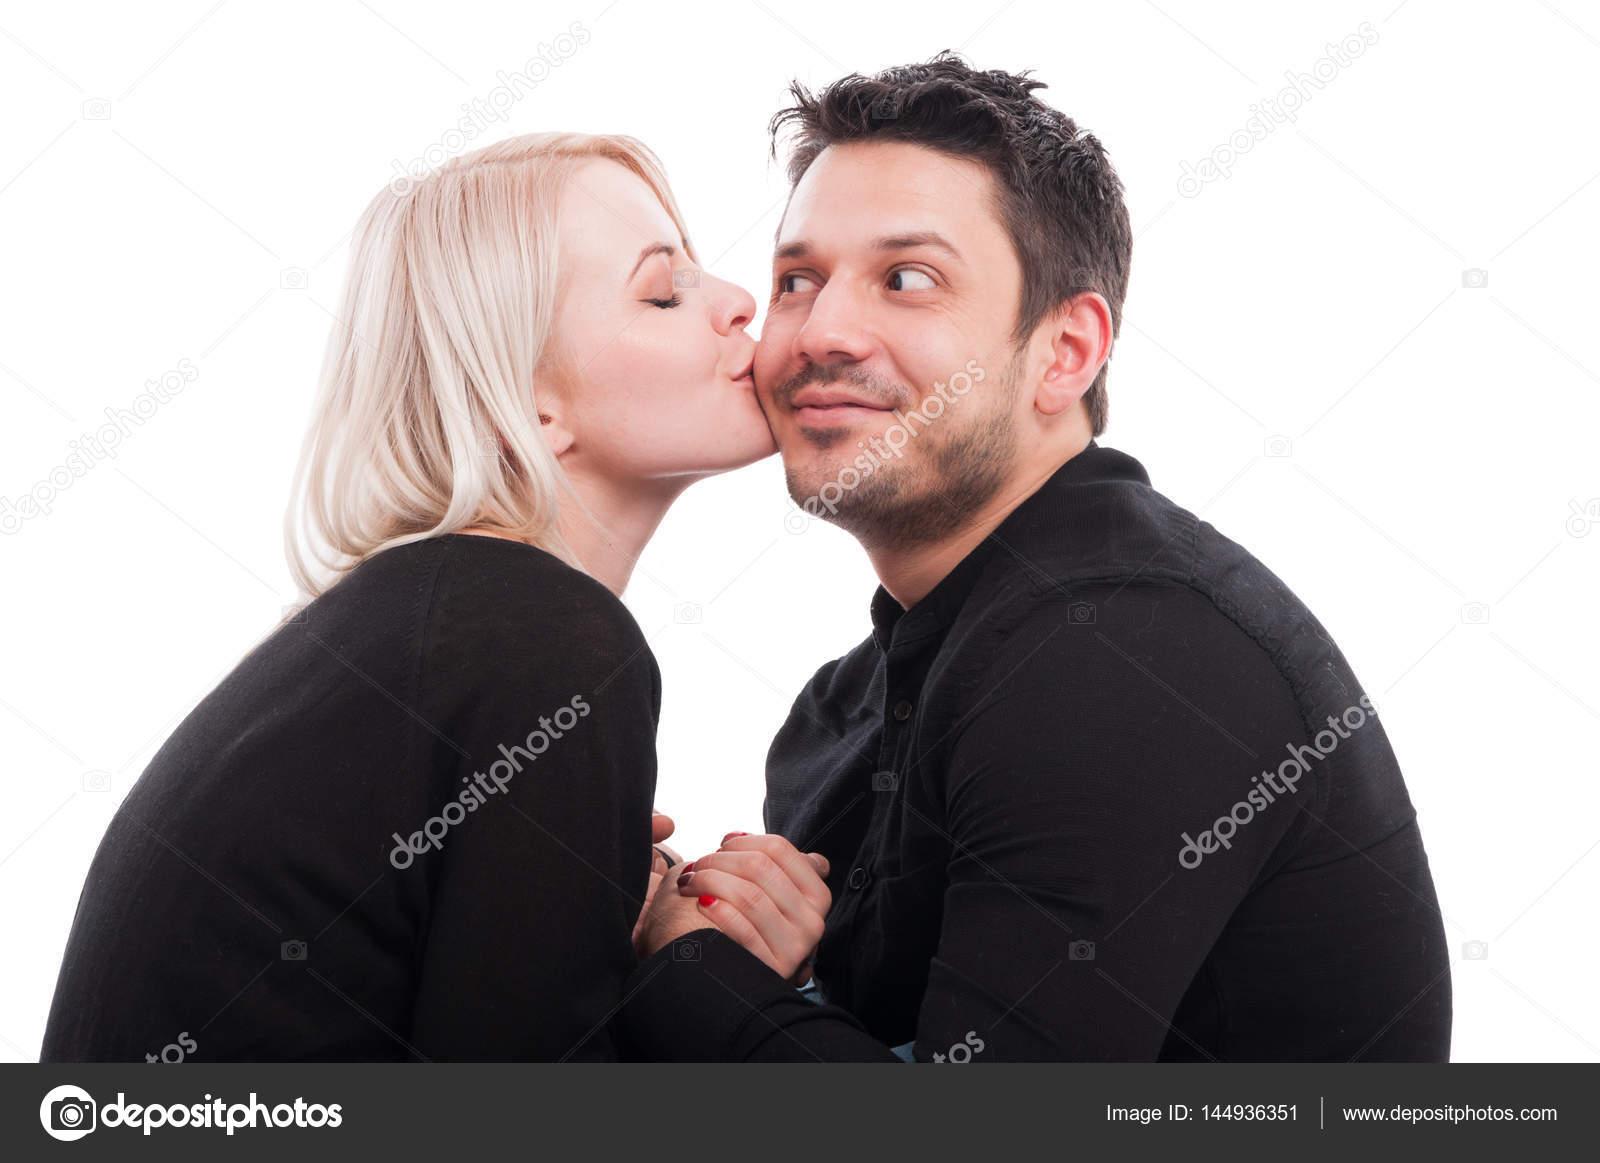 Lauren henderson jane austen przewodnik po randkach